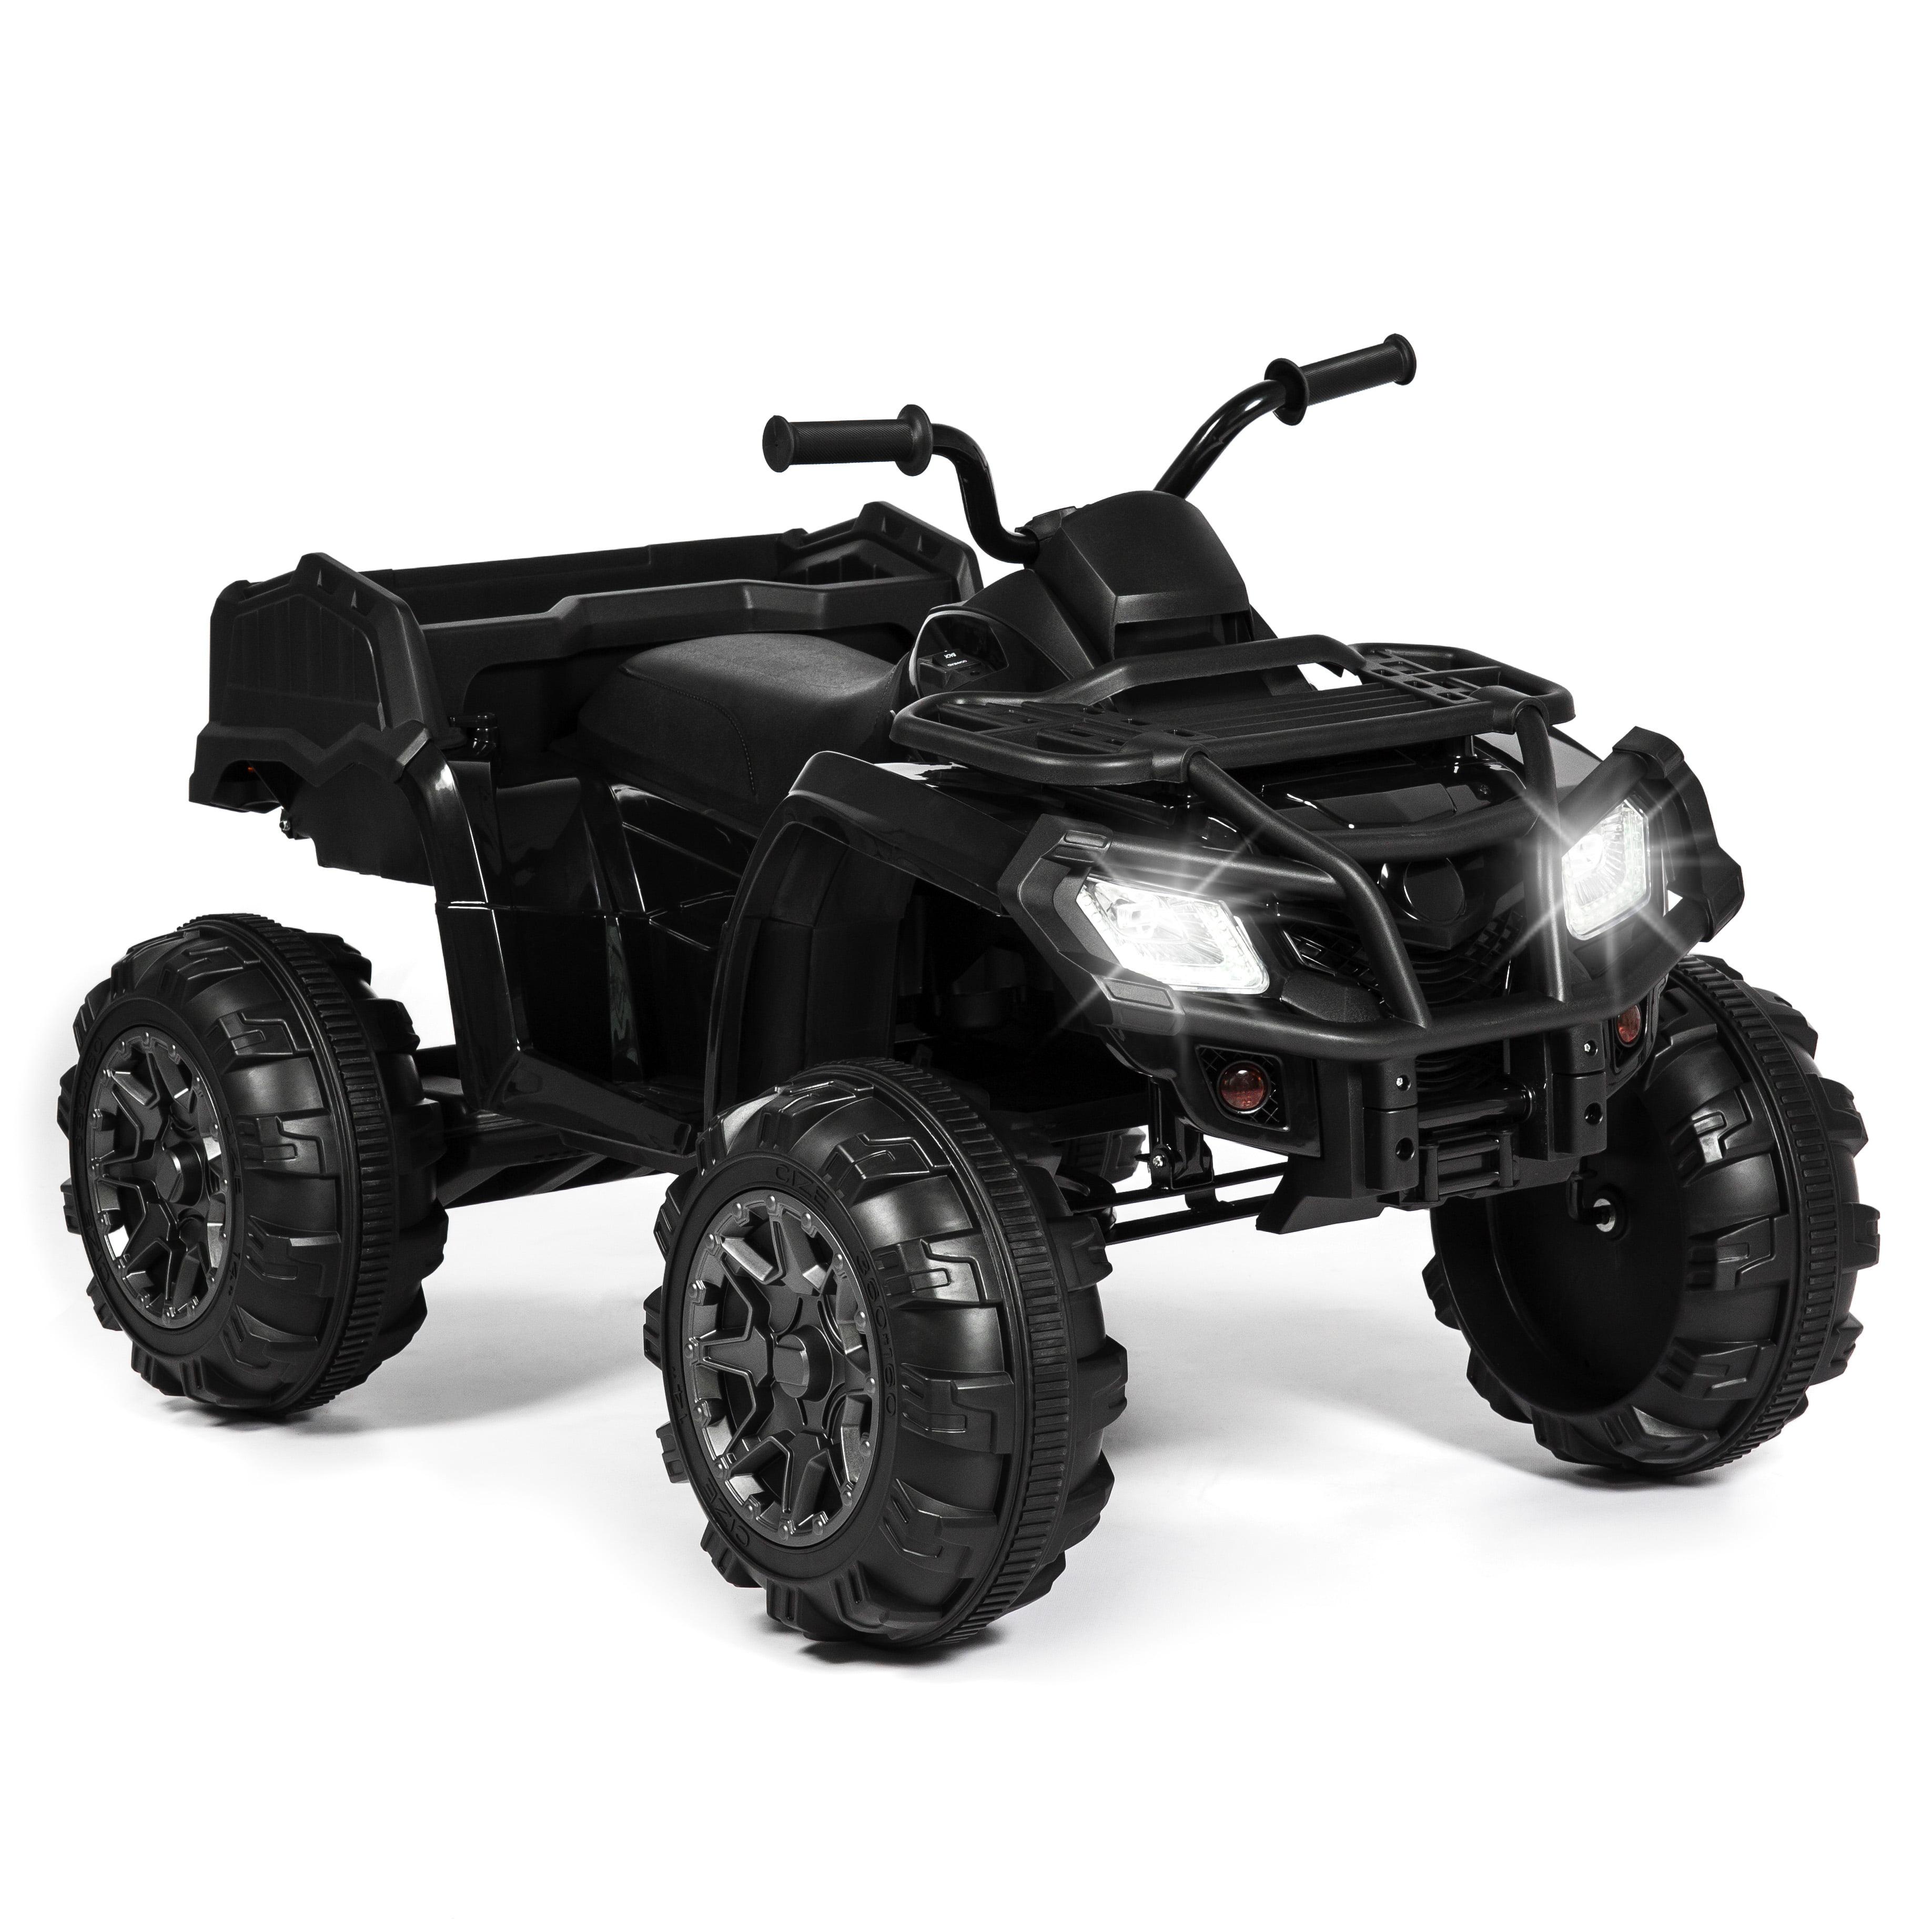 Best Choice Products 12V Kids Powered Large ATV Quad 4-Wheeler Ride-On Car w/ 2 Speeds, Spring Suspension, MP3, Lights, Storage - Black